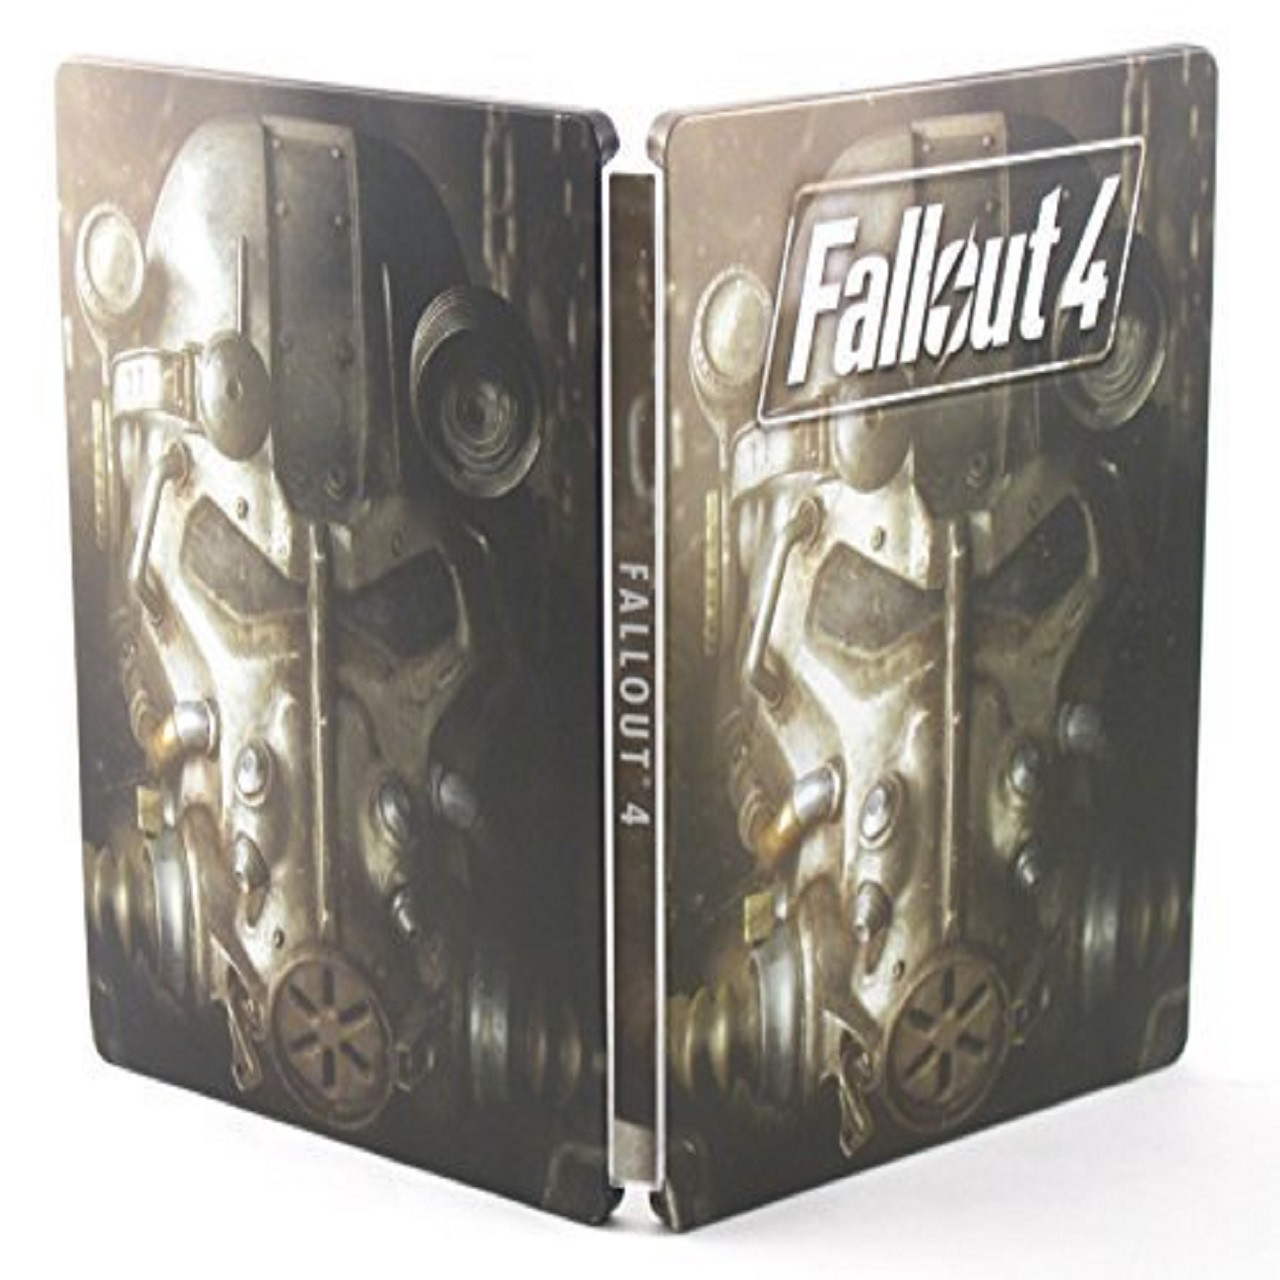 Fallout 4 (steelbook) (английская версия) PS4 (Б/У)